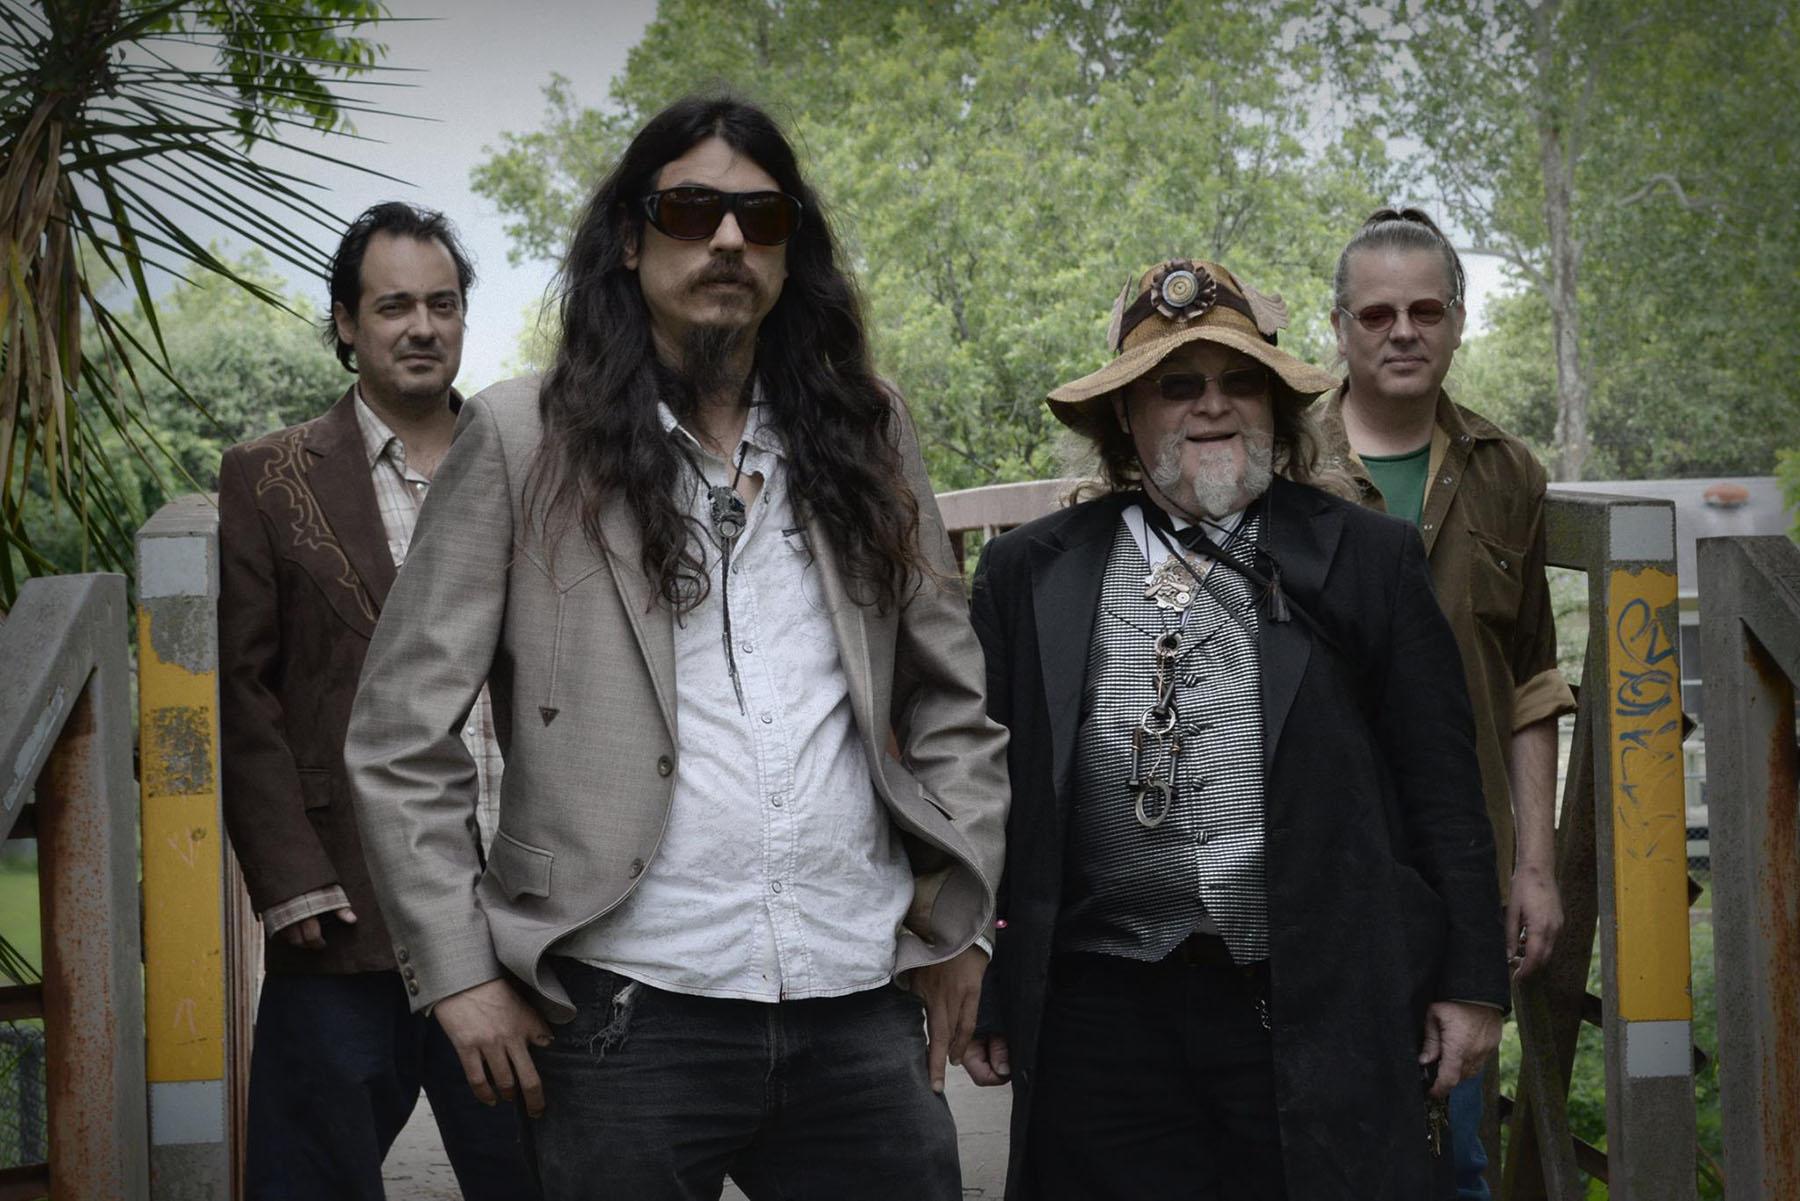 Choctaw Wildfire Band - Austin, TX.